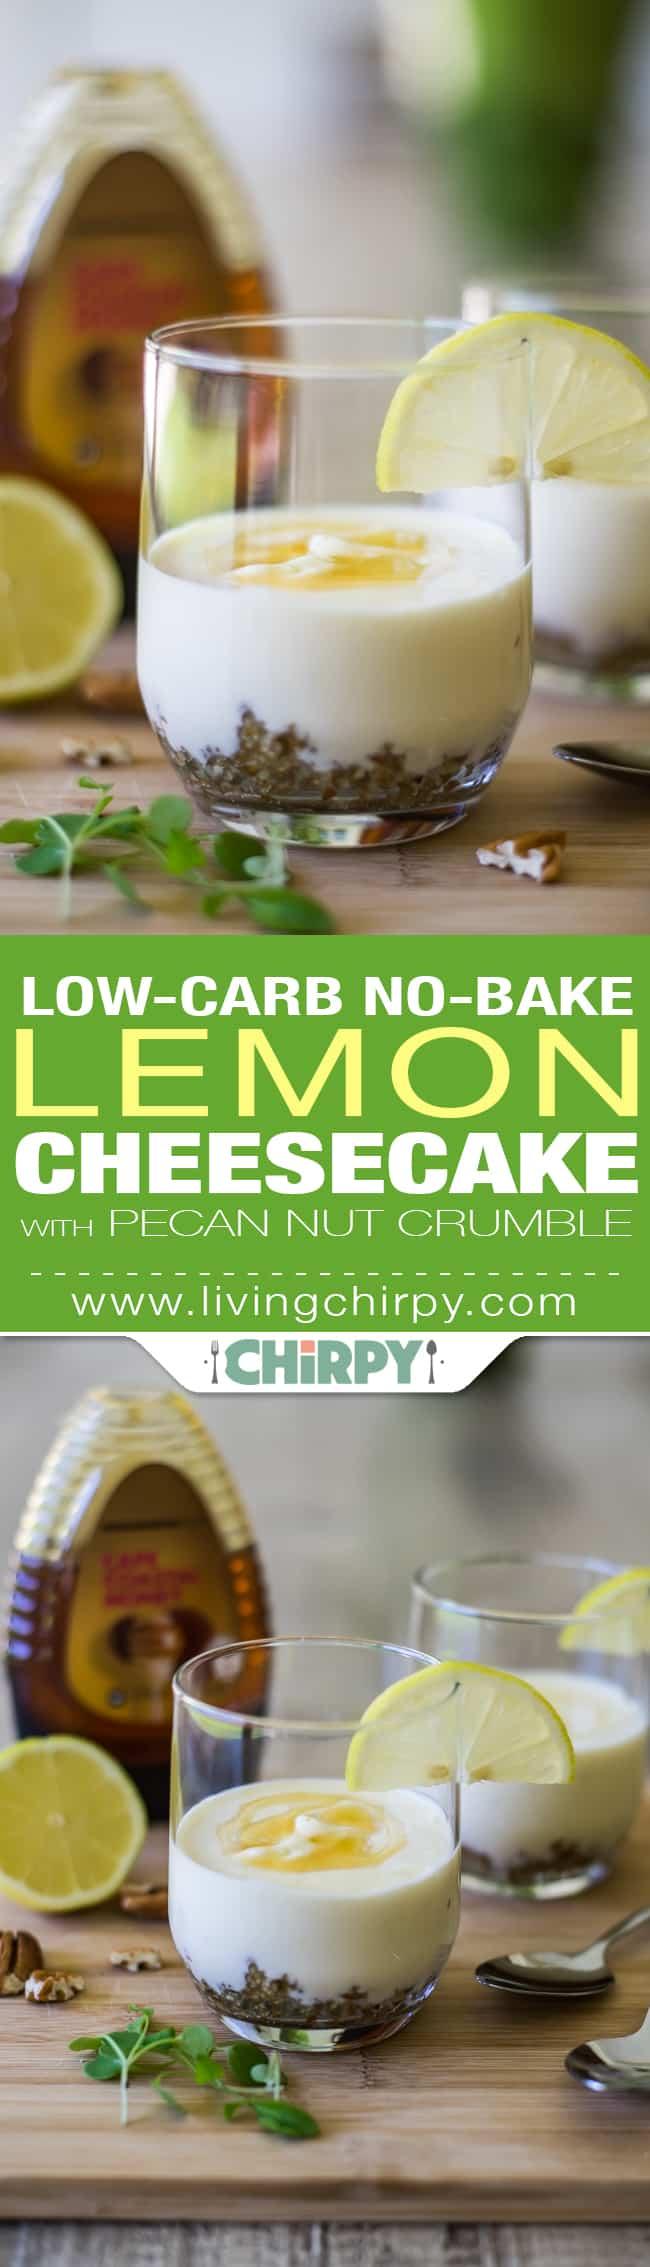 Low carb no bake lemon cheesecake pin